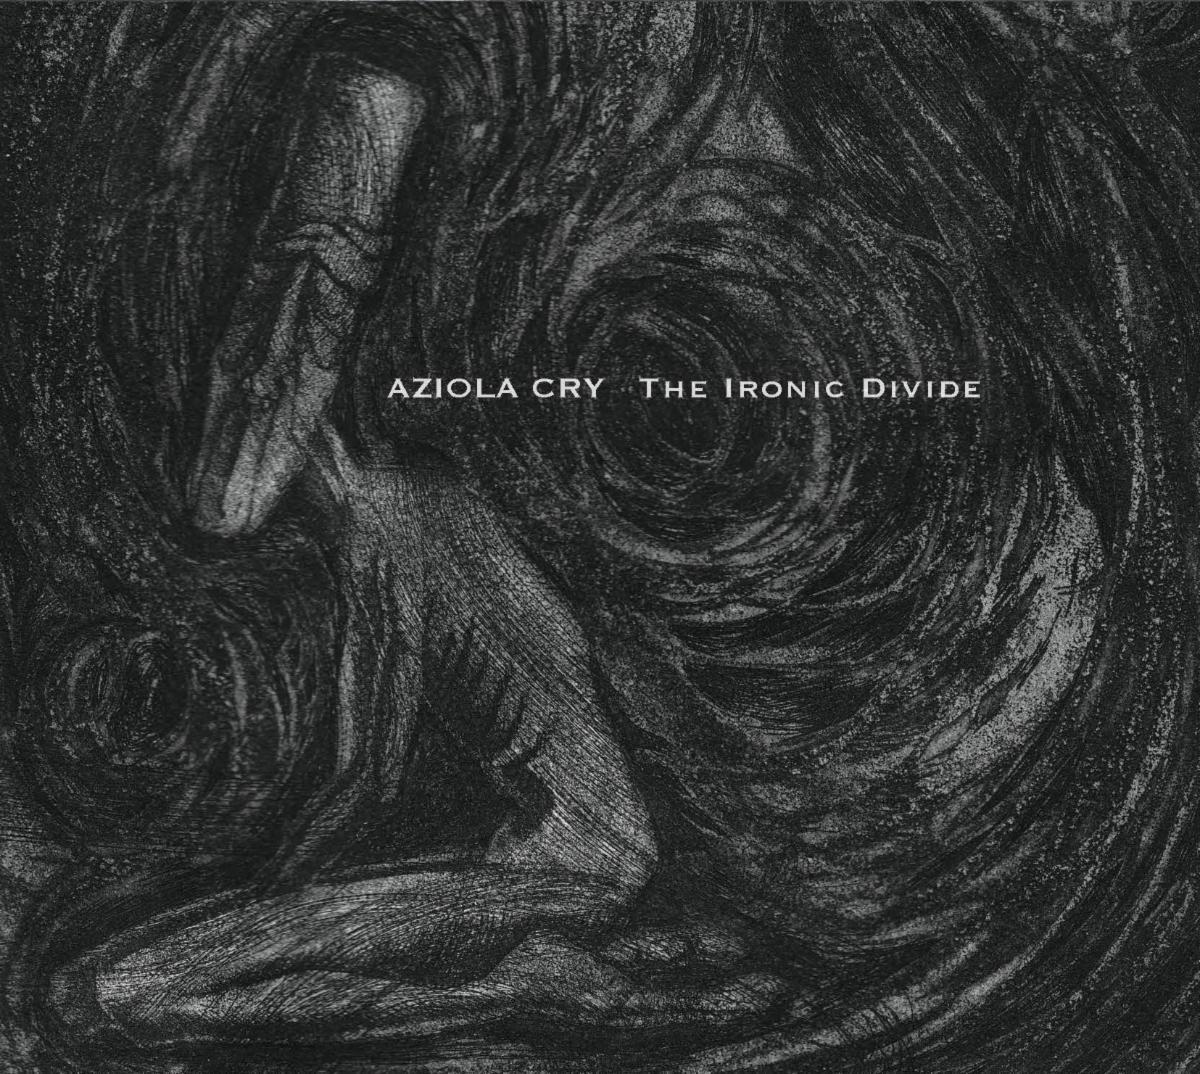 Aziola Cry Album The Ironic Divide